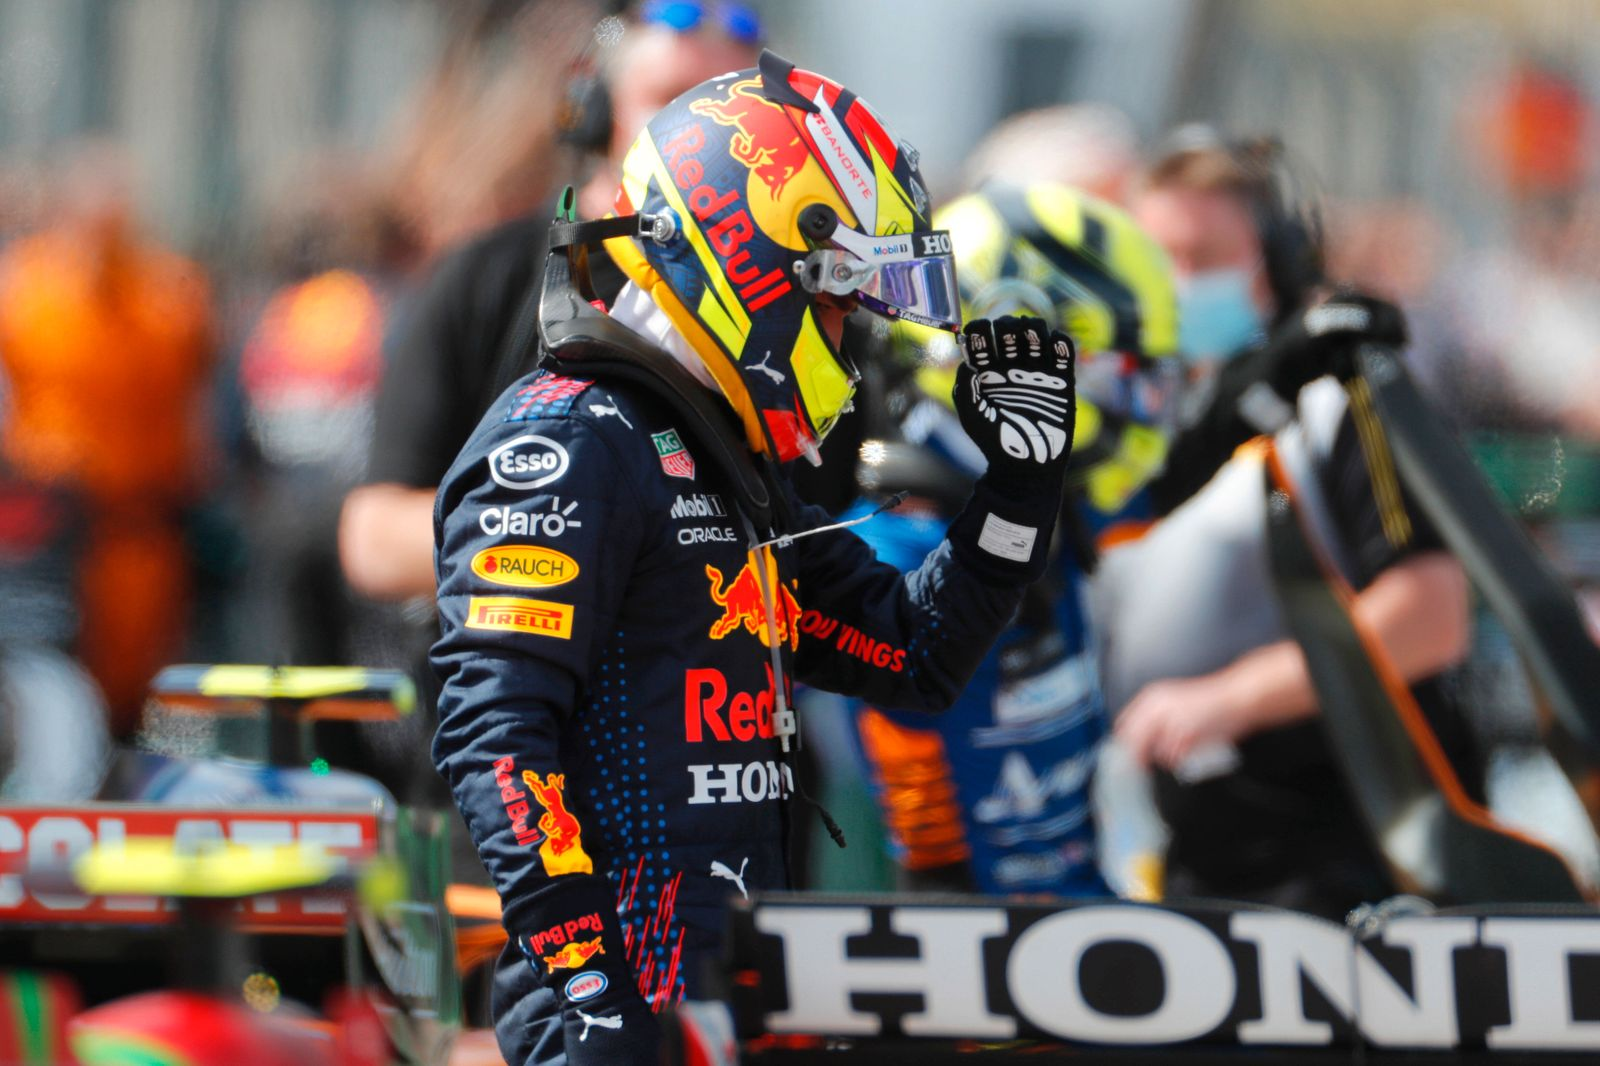 Formula 1 2021: Portuguese GP ALGARVE INTERNATIONAL CIRCUIT, PORTUGAL - MAY 02: Sergio Perez, Red Bull Racing, in Parc